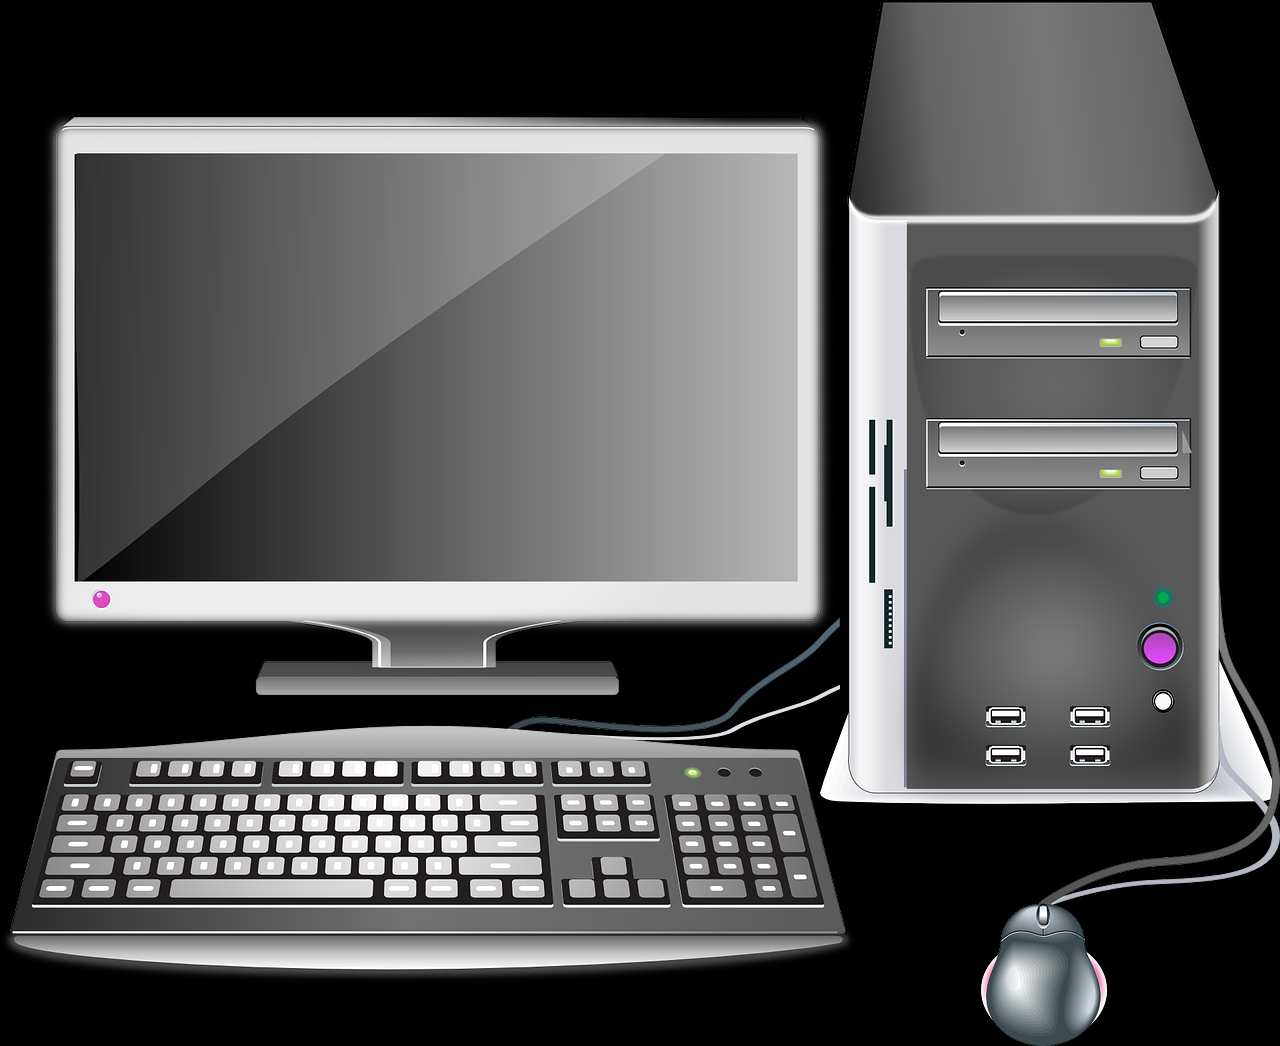 Cara Mengatasi Komputer Restart Sendiri